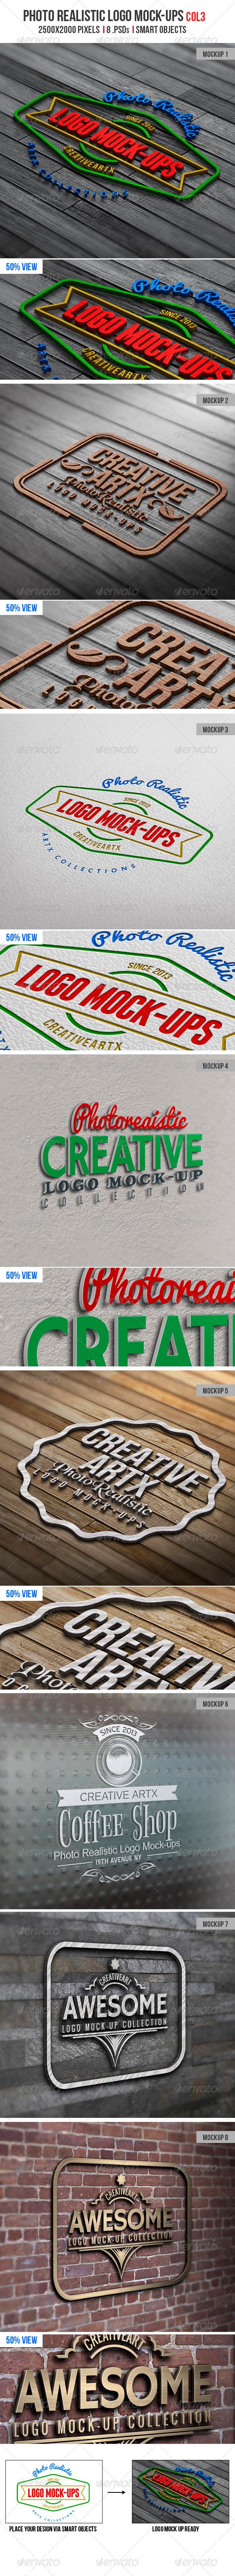 Photorealistic Logo Mock-Ups Col.3 - Logo Product Mock-Ups